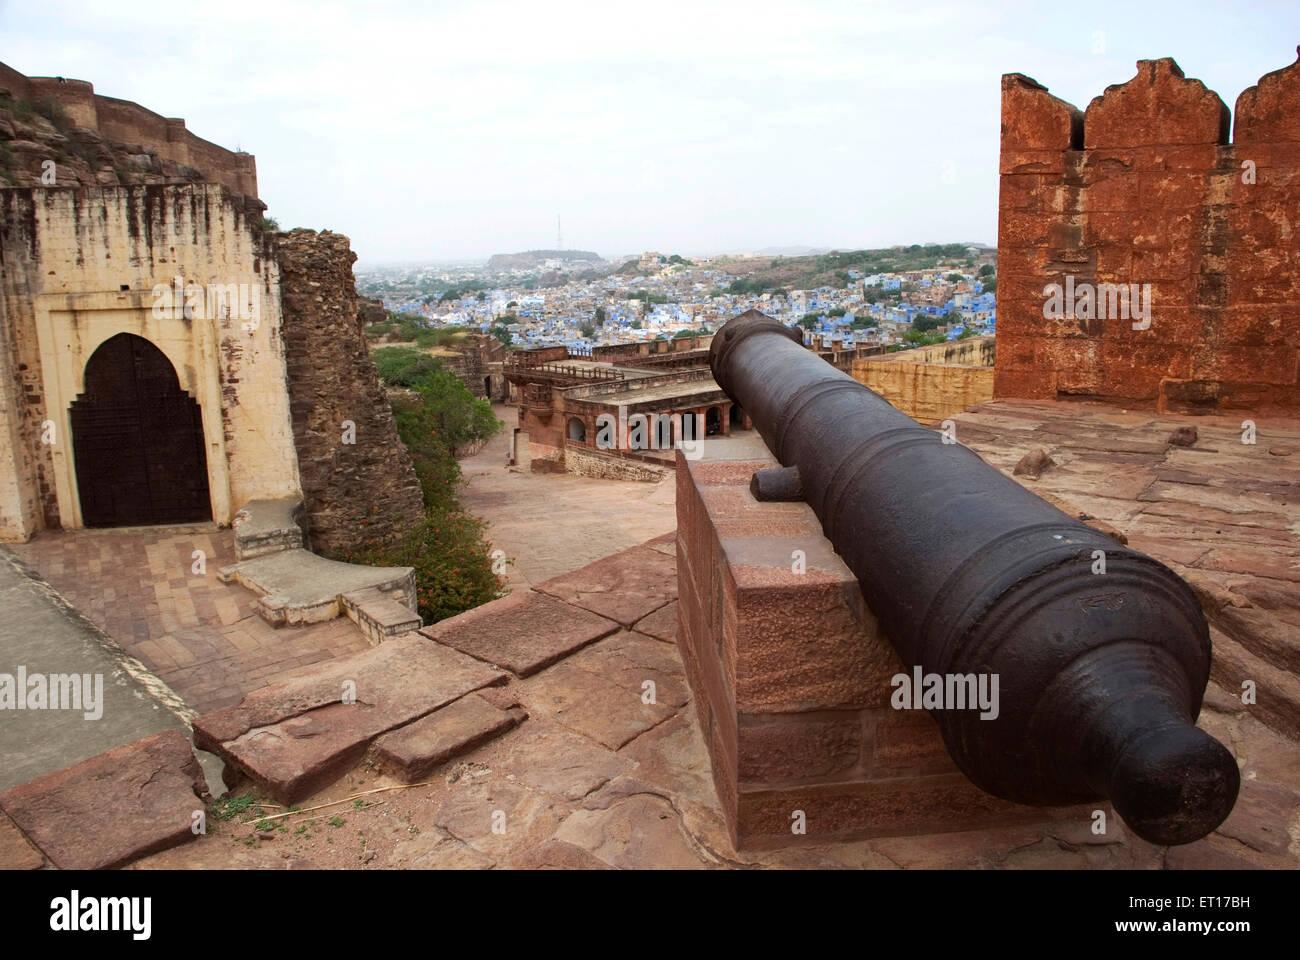 Canon ; Mehrangarh fort ; Jodhpur ; Rajasthan ; India - Stock Image